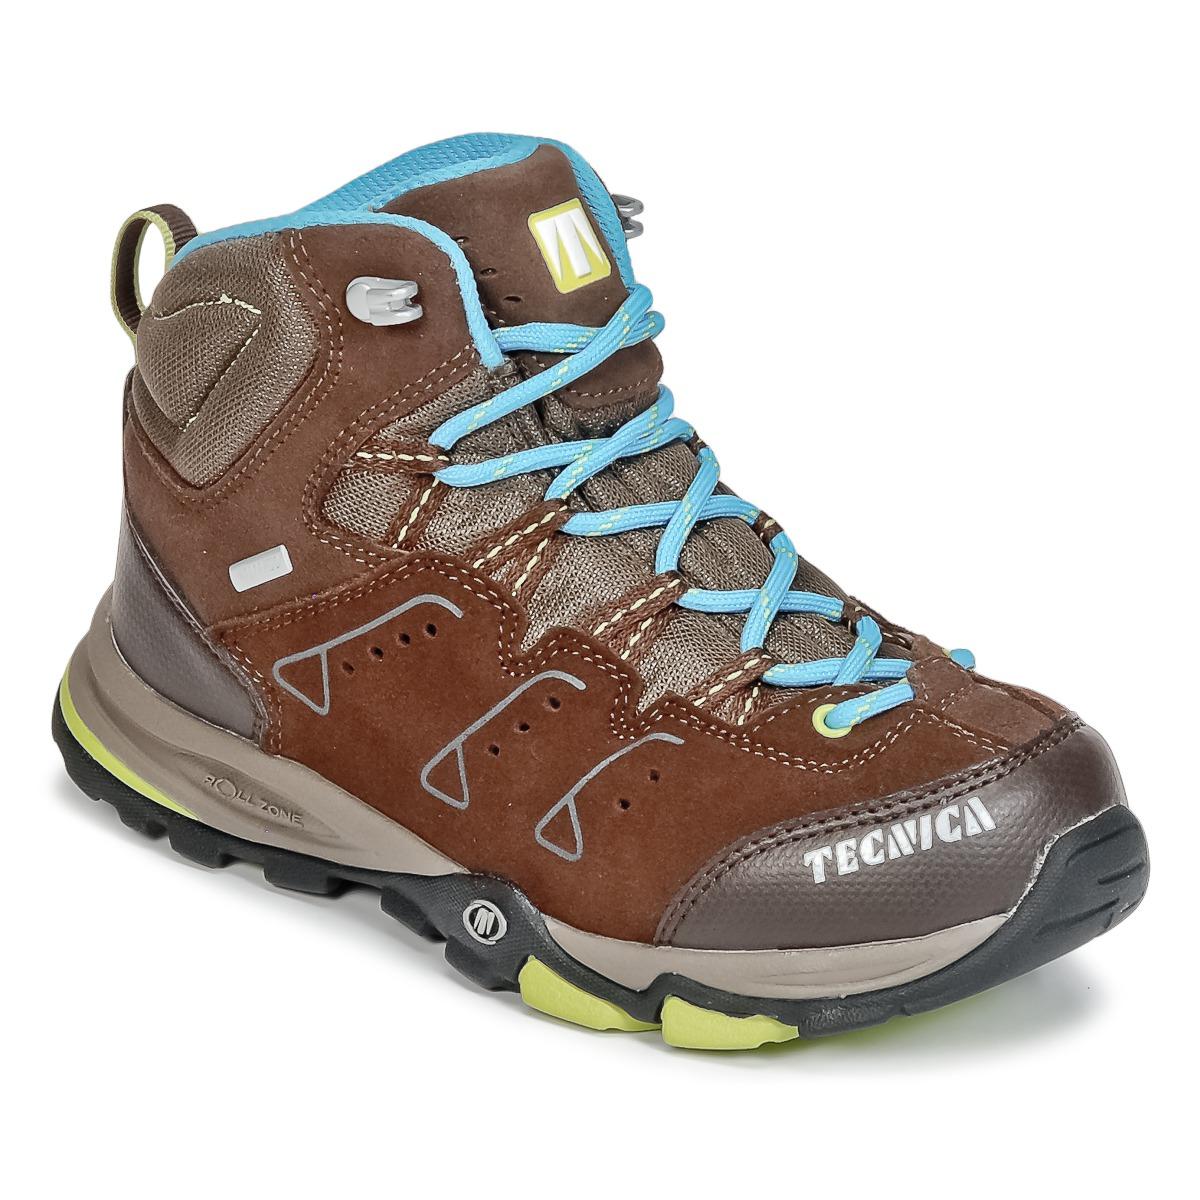 Chaussures-de-randonnee Tecnica CYCLONE III MID TCY JUNIOR Marron / Bleu